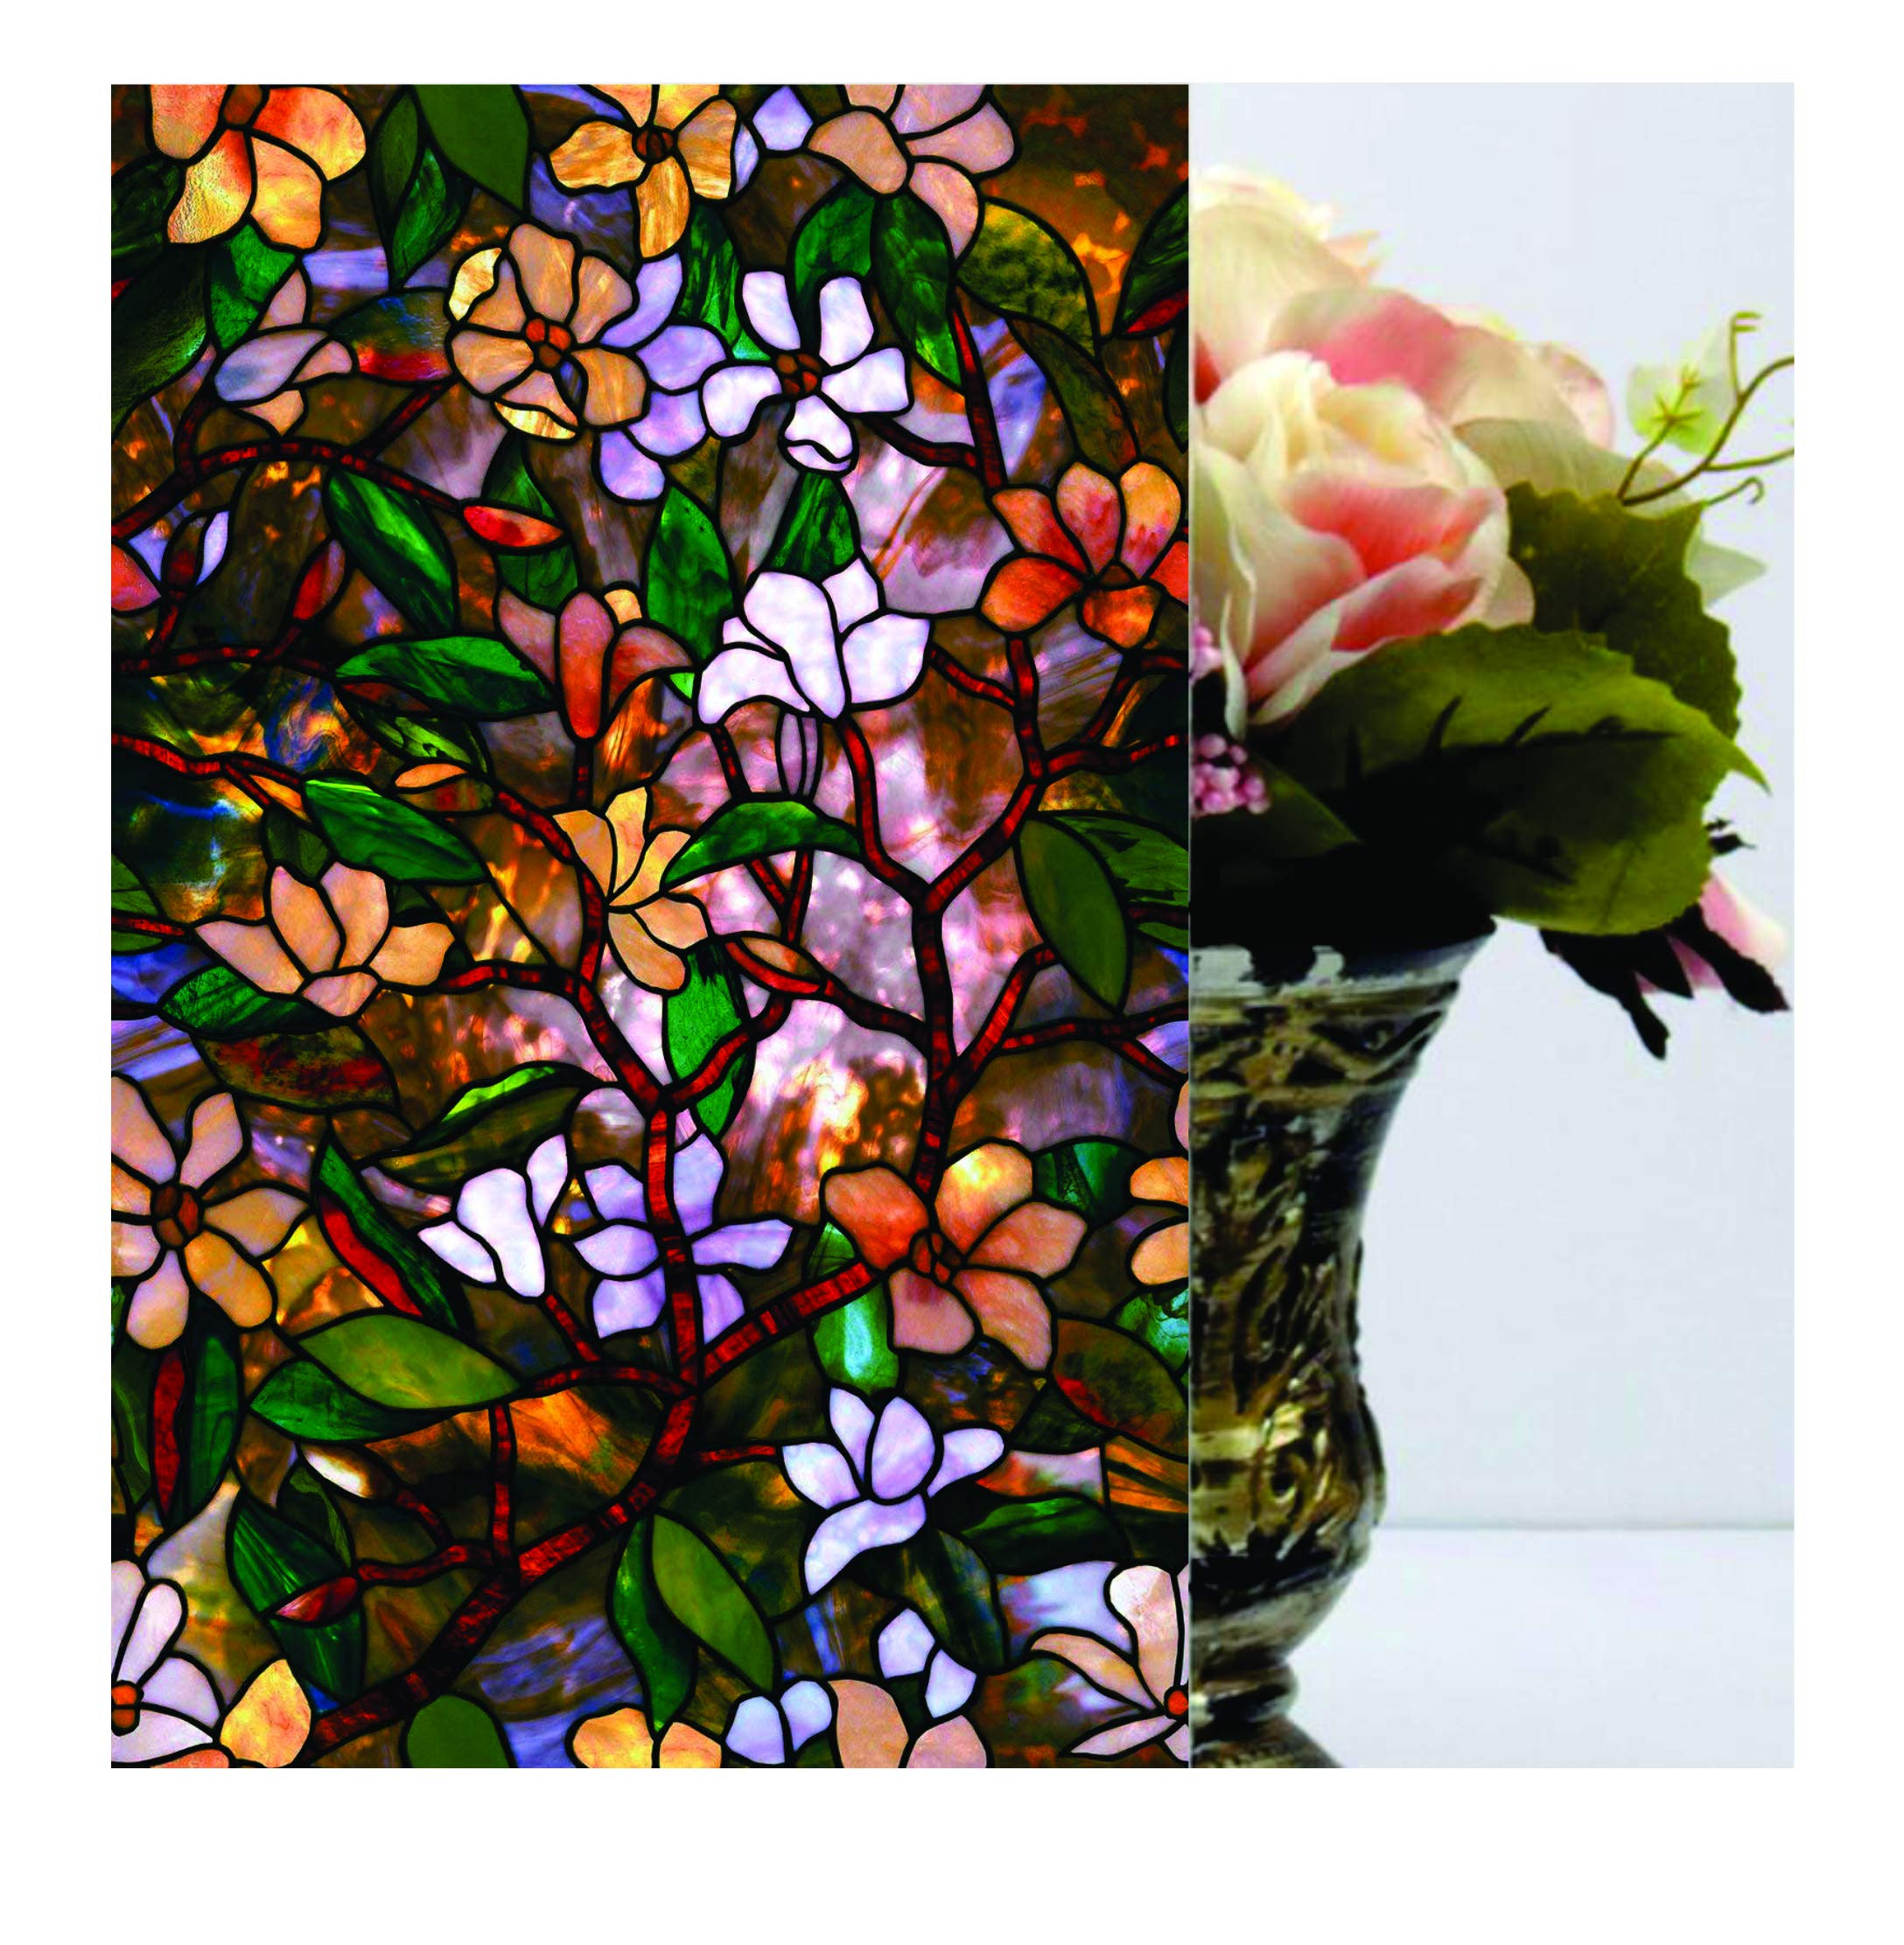 Elton 3D Window Films Privacy Film Self Adhesive Decorative Film for Bathroom Door Window Heat Control Anti UV (Green Flower) 16 x 144 inches (B07KXWF2DF) Amazon Price History, Amazon Price Tracker